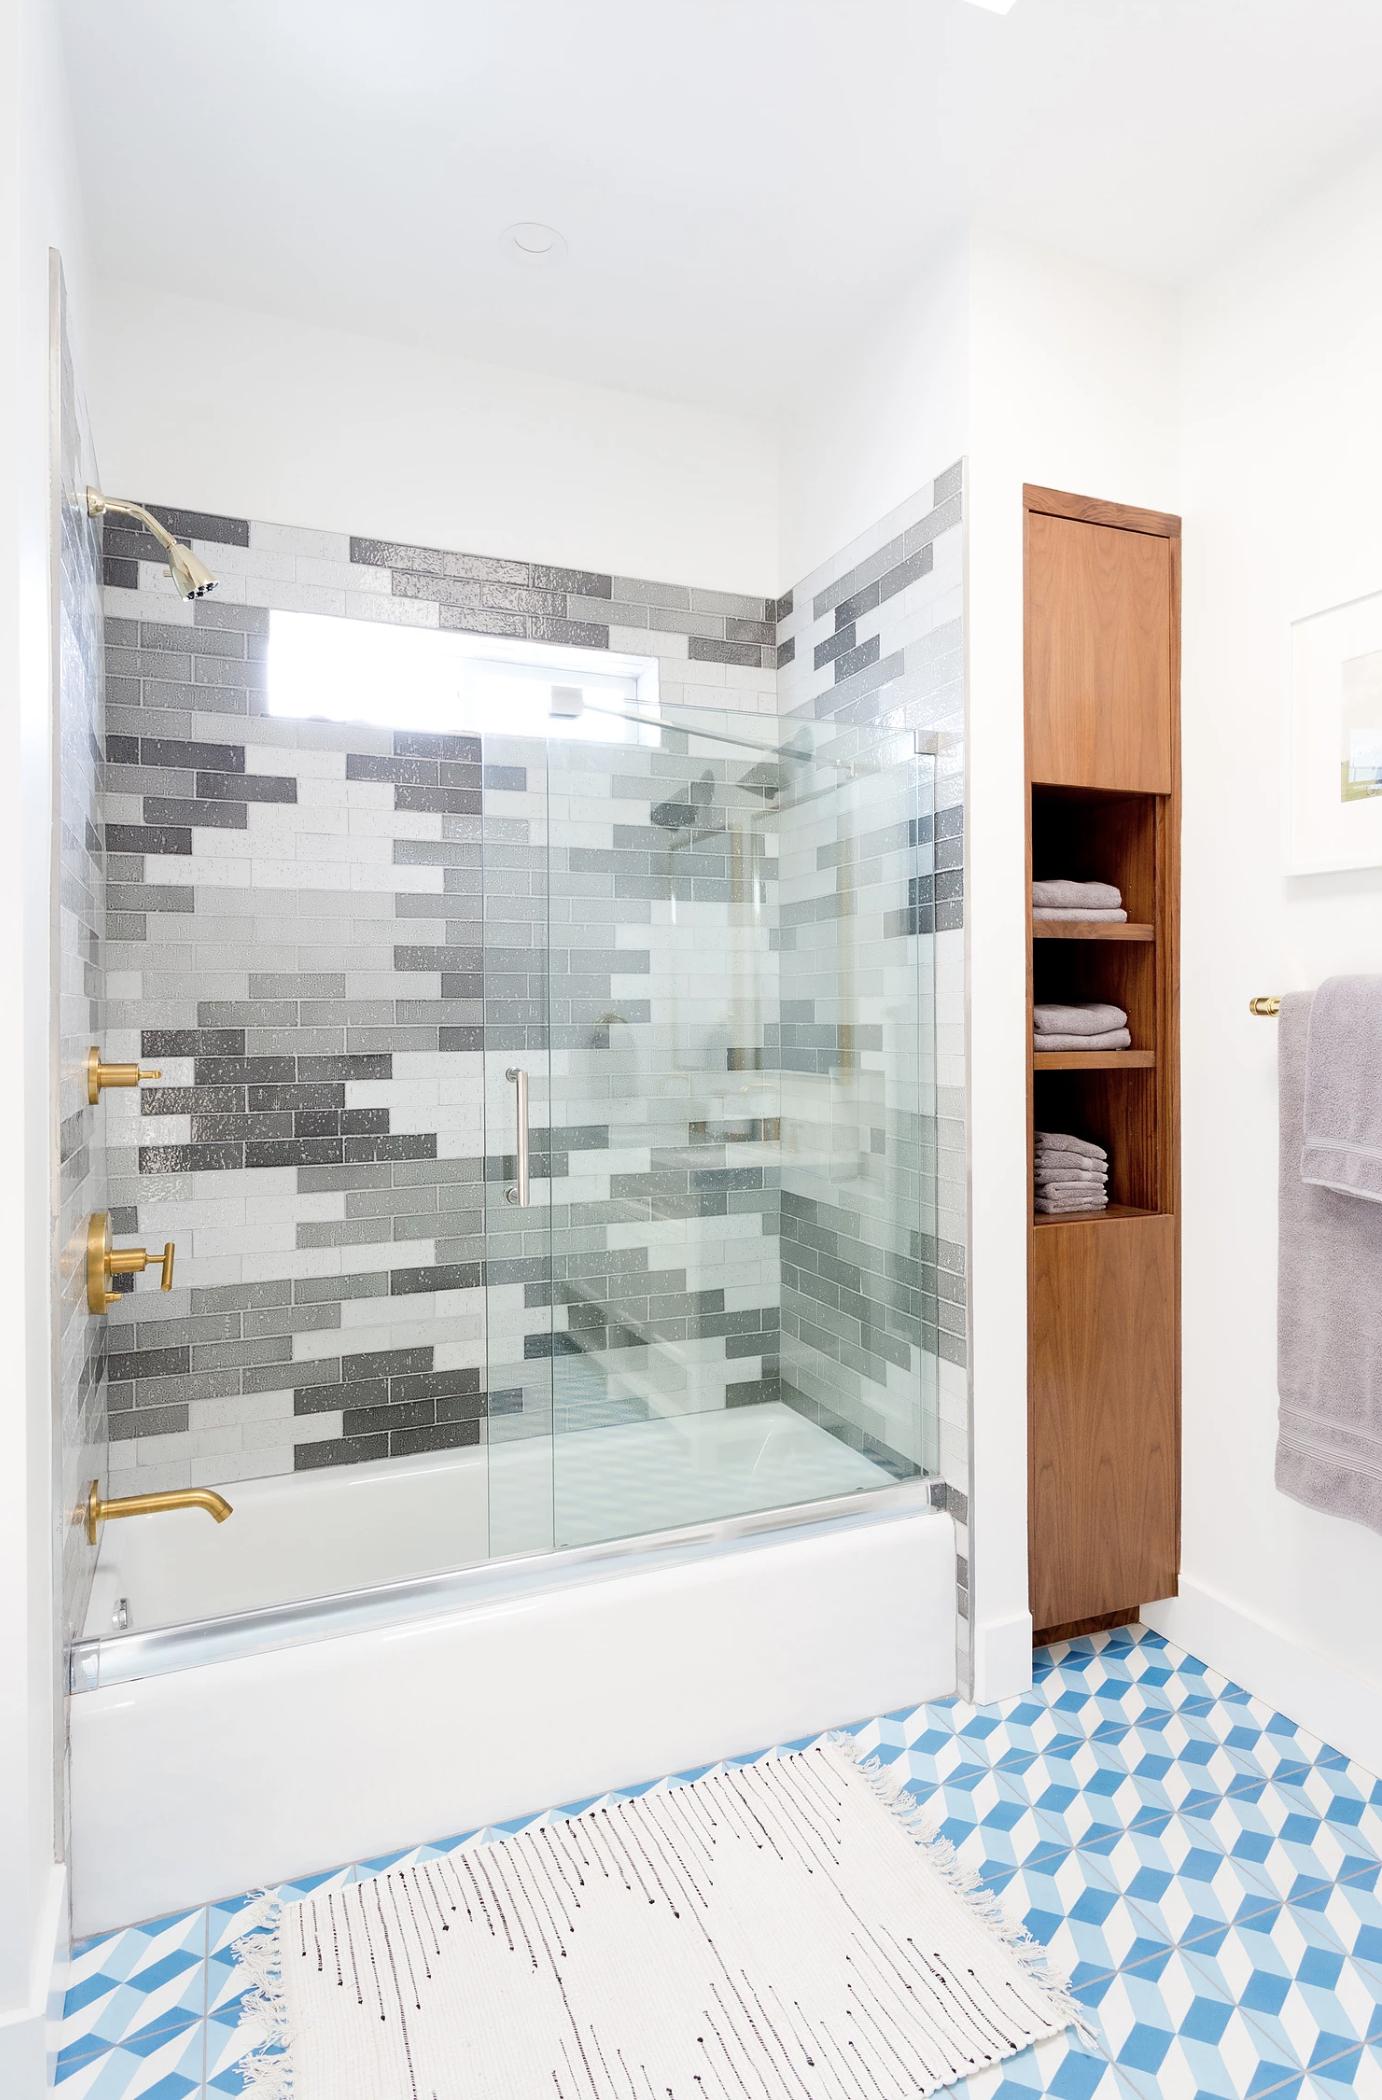 18 Best Bathroom Colors - Top Paint Color Schemes for Bathroom Walls